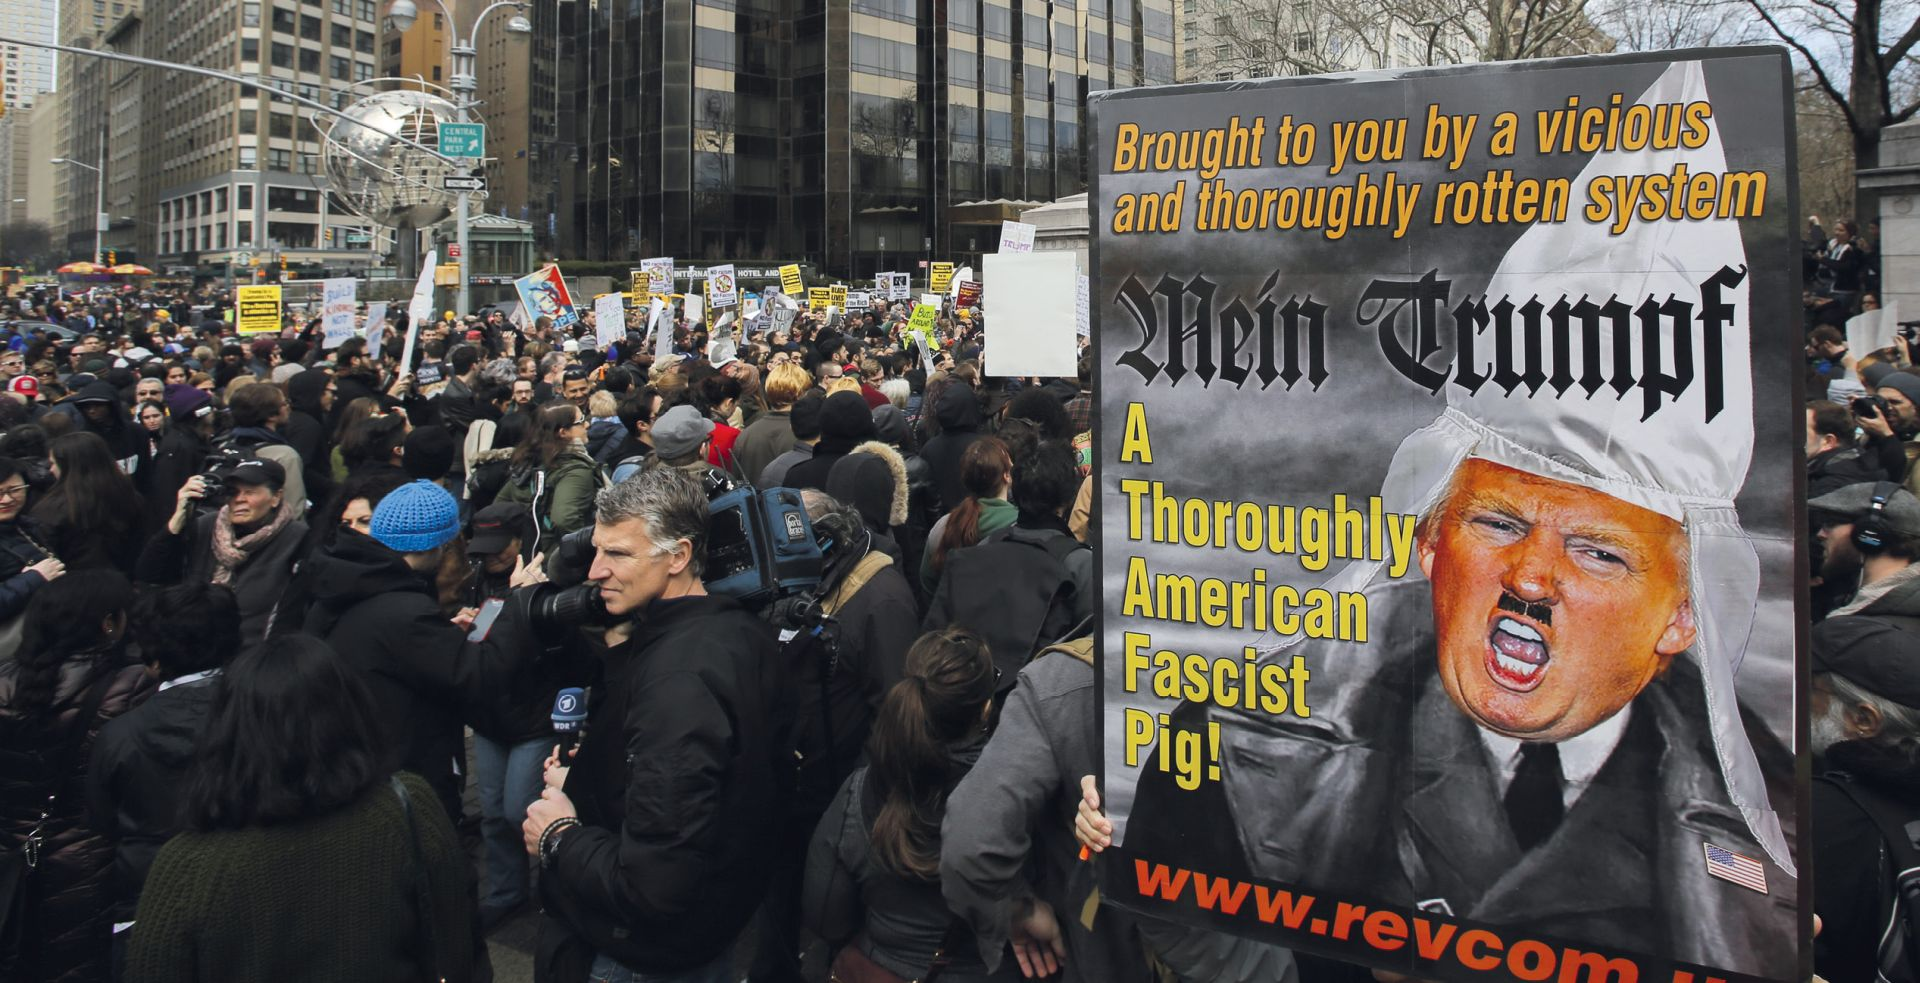 Liberalni Hollywood u borbi protiv 'ksenofobnog fašista' Donalda Trumpa